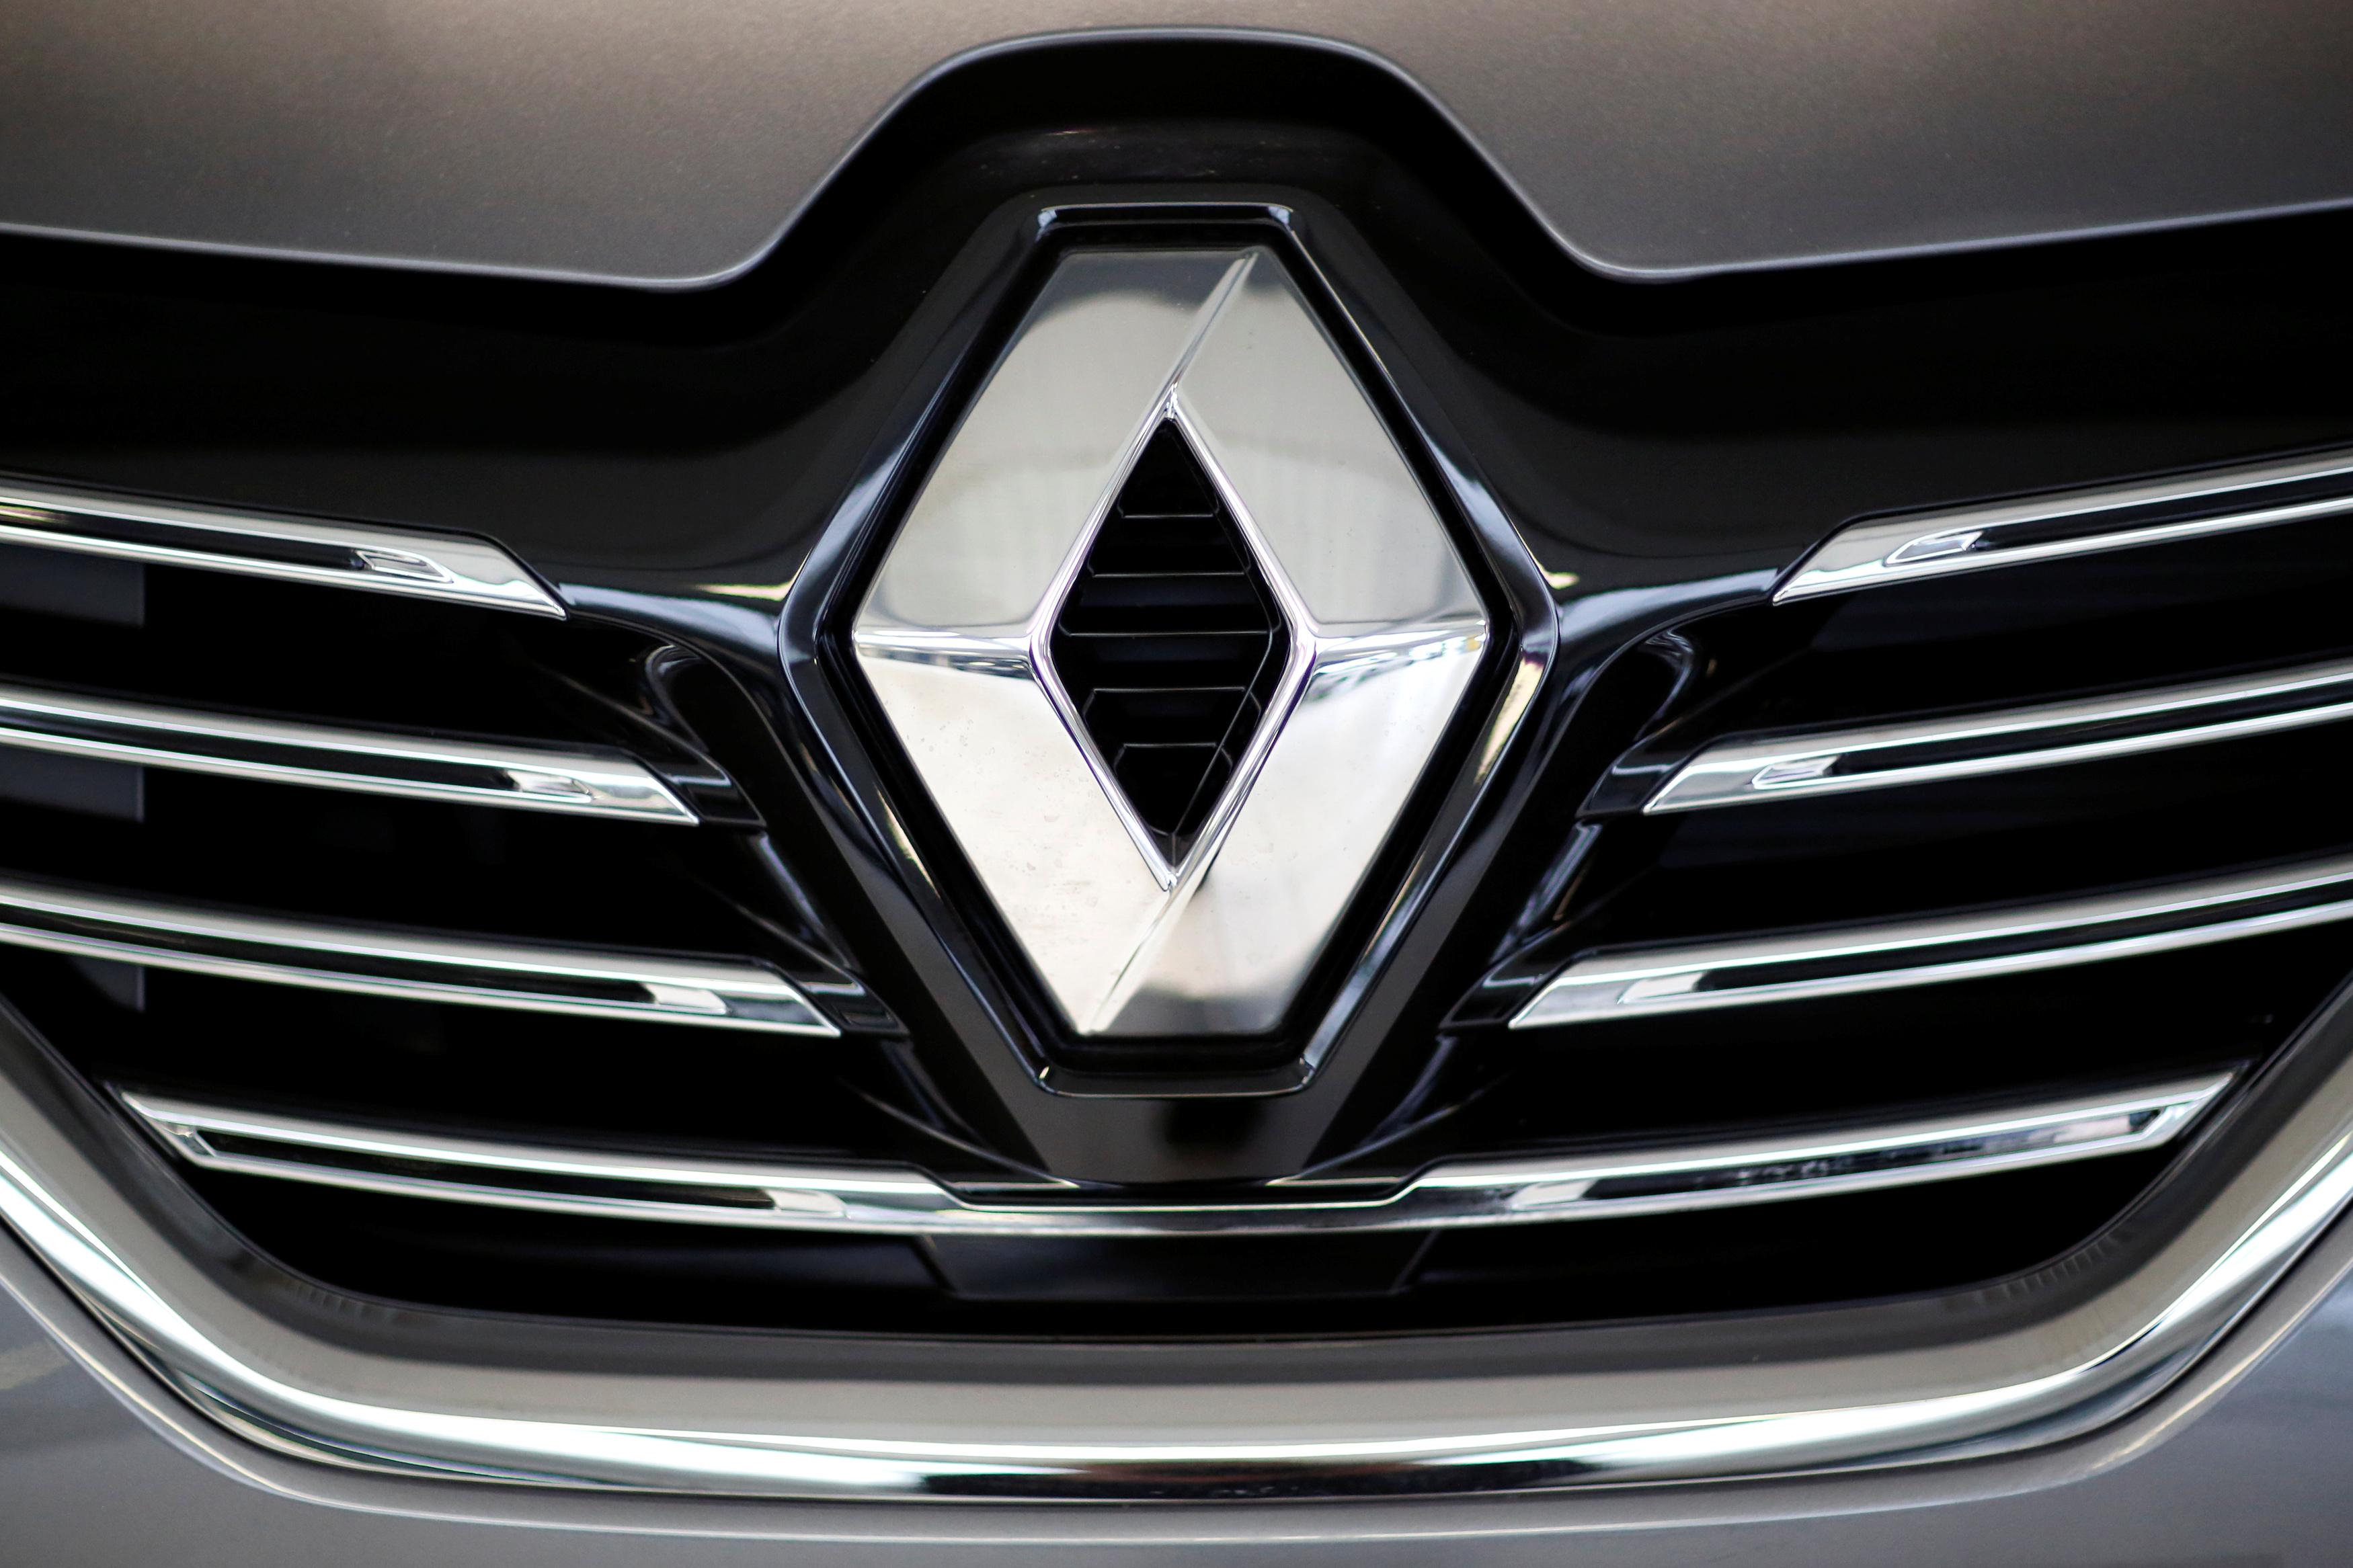 The Renault logo on a Renault Espace car at a dealership in Les Sorinieres near Nantes, France, November 24, 2015. REUTERS/Stephane Mahe/File Photo